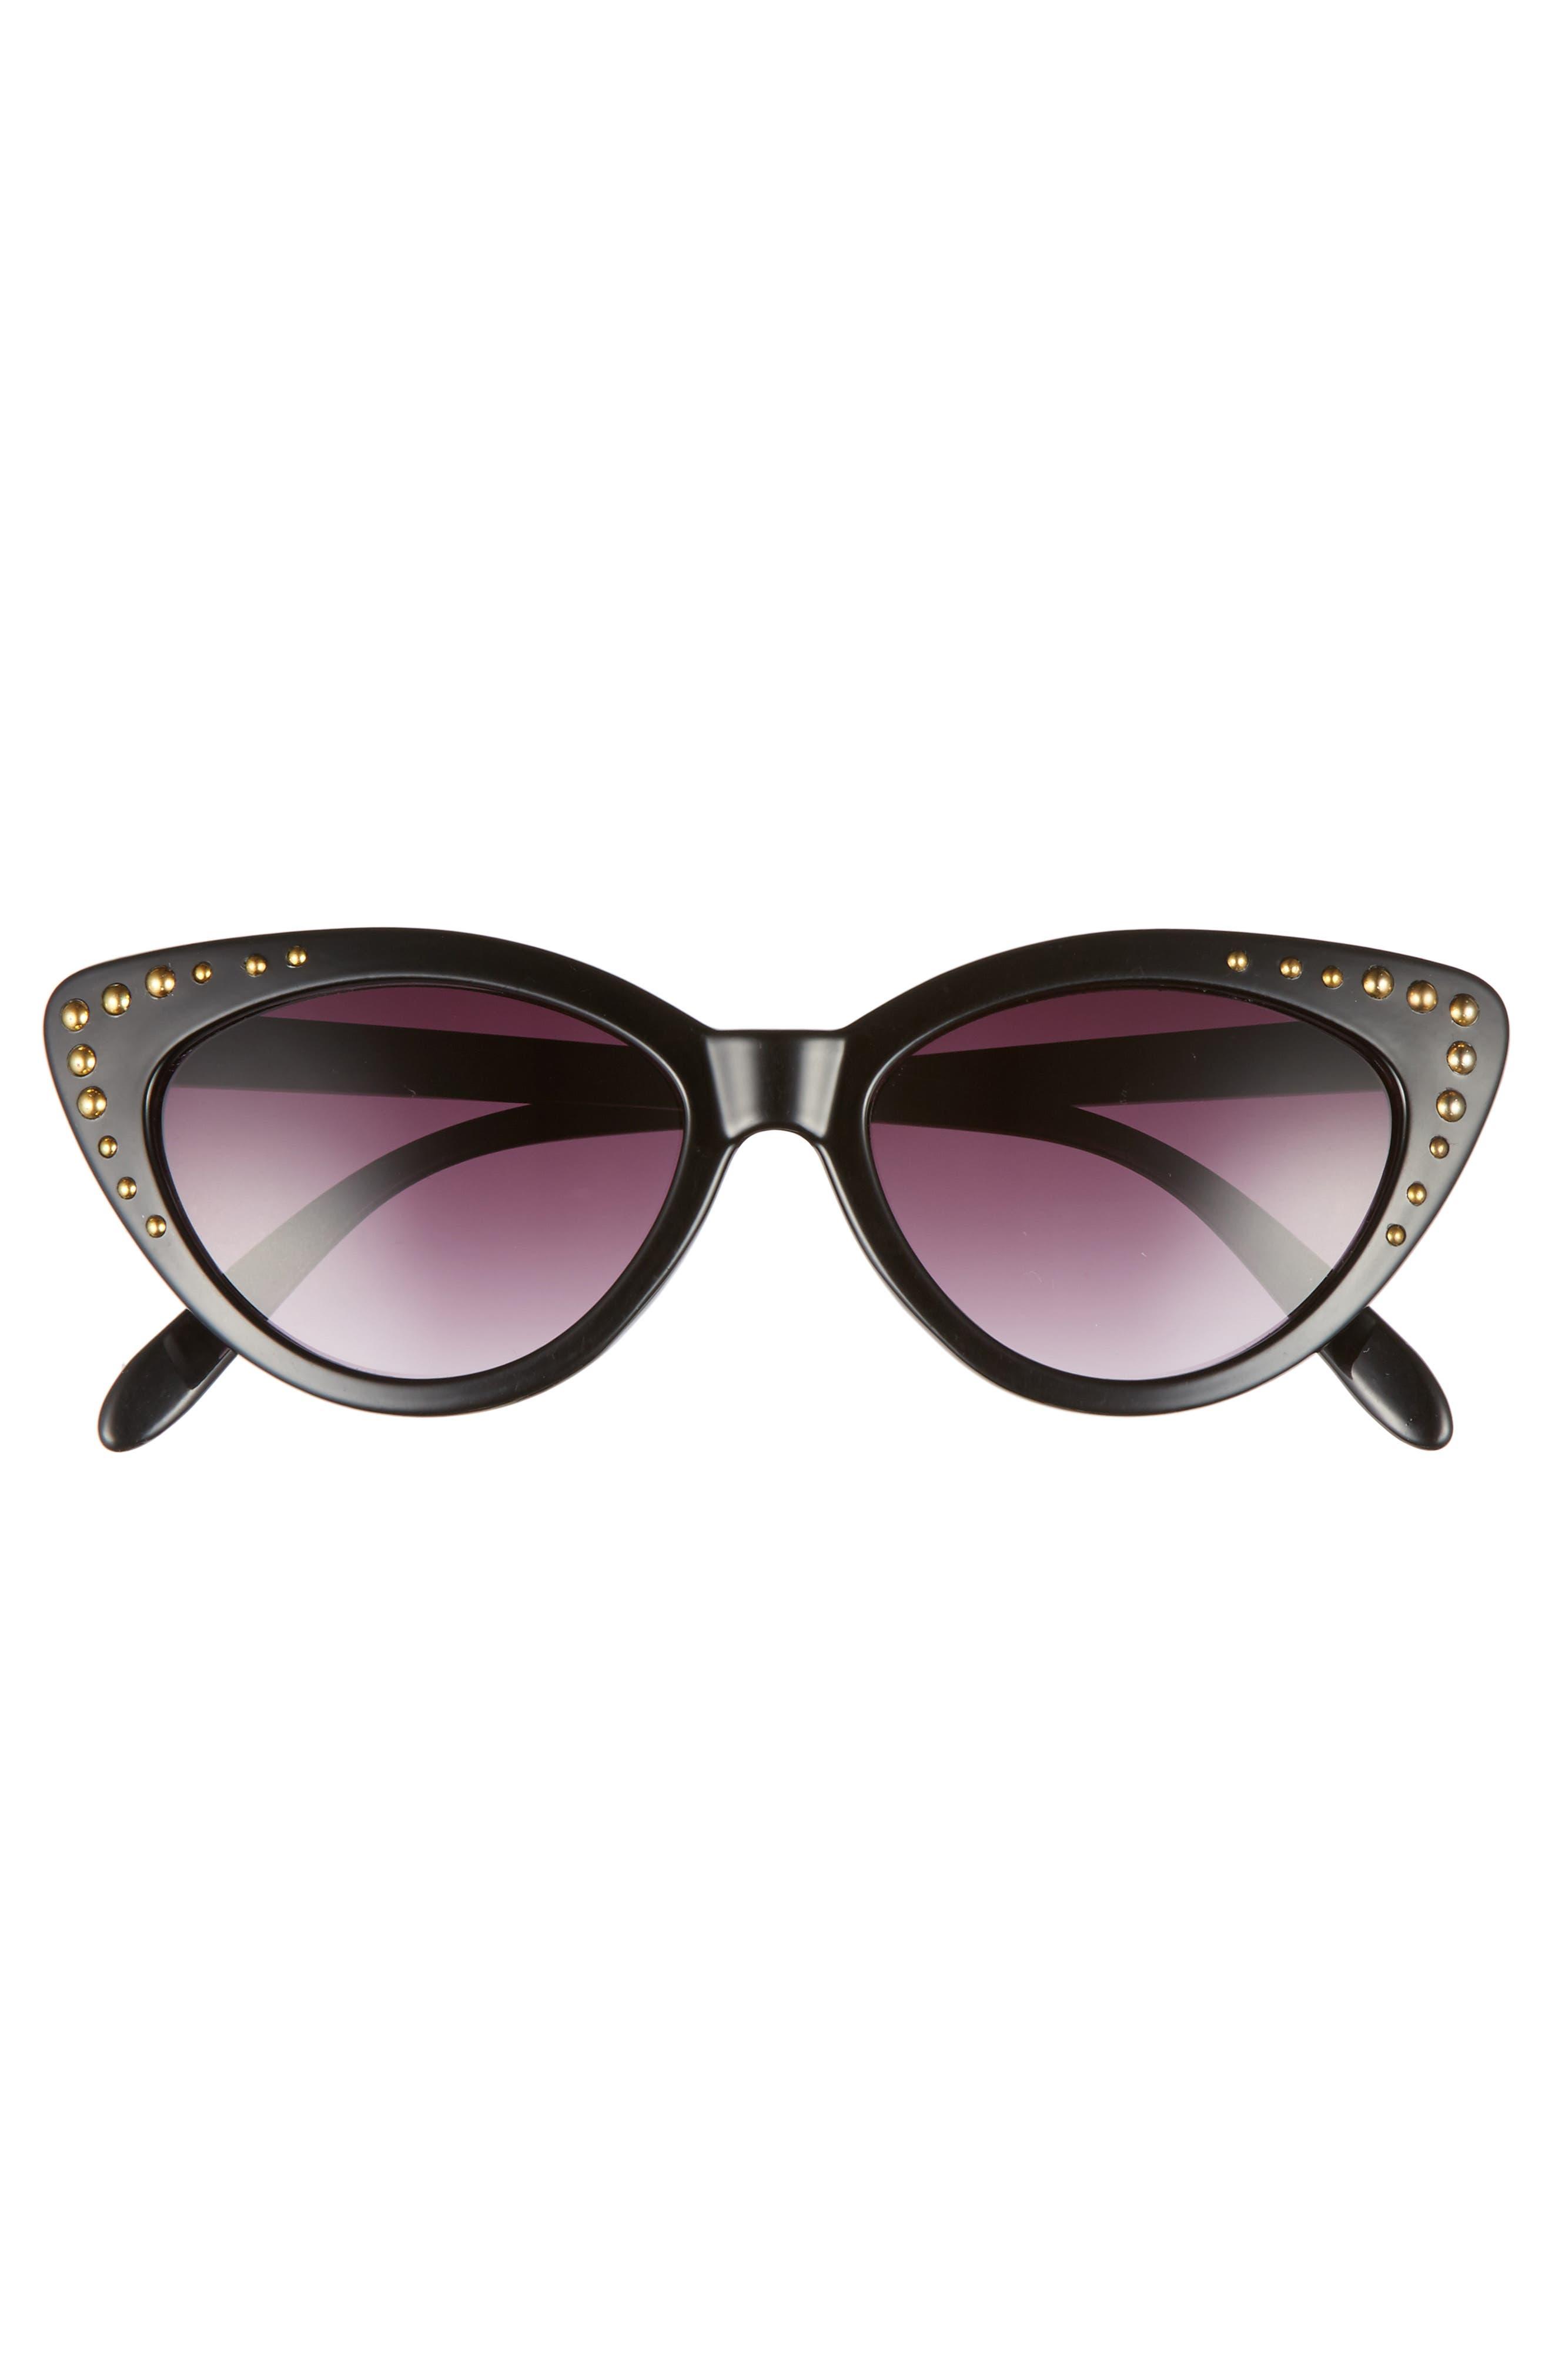 52mm Stud Detail Cat Eye Sunglasses,                             Alternate thumbnail 3, color,                             Black/ Gold